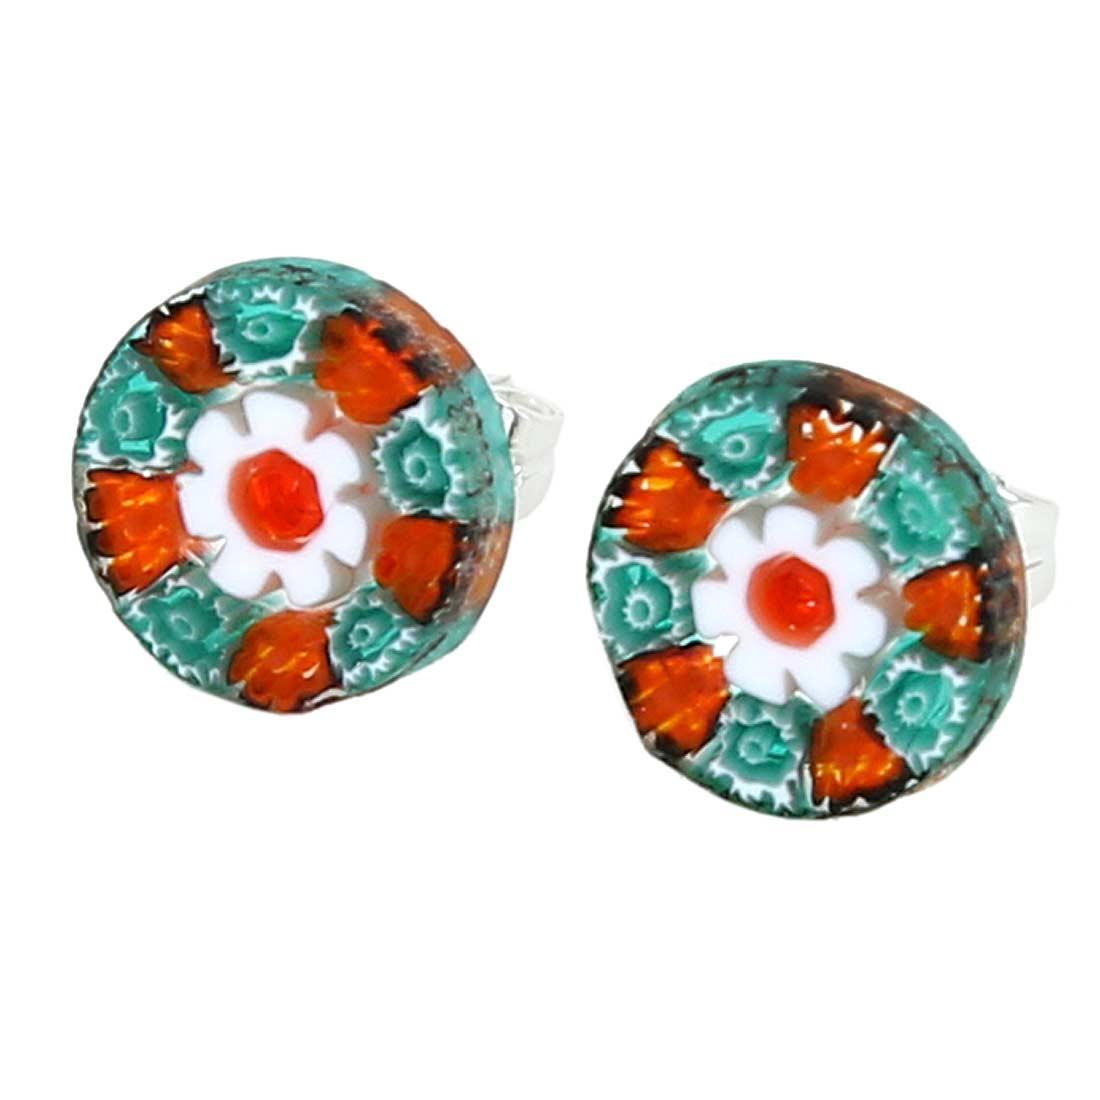 Millefiori Stud Earrings - Round #7